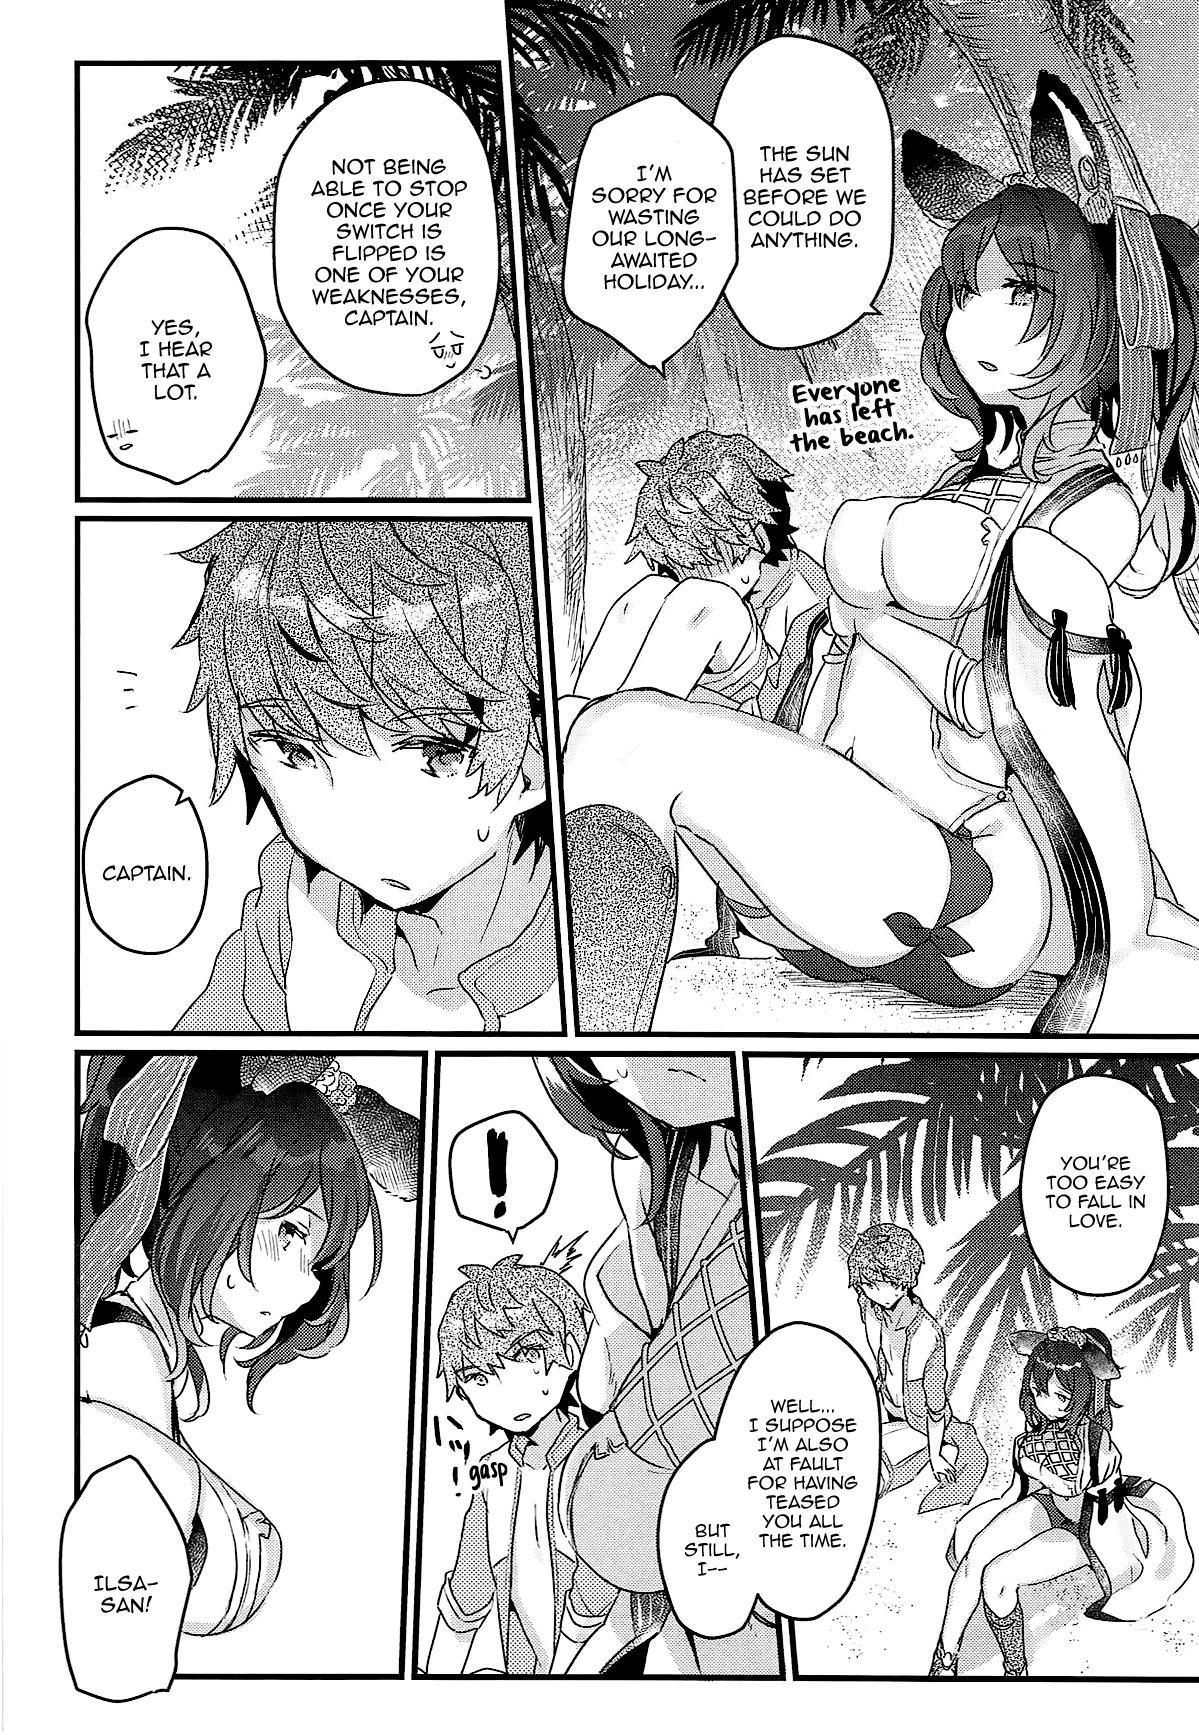 (COMIC1☆15) [Tenkirin (Kanroame)] Ilsa-san to Guste de Vacances | A Vacation to Auguste Isles With Ilsa-san (Granblue Fantasy) [English] [Aoitenshi] 19